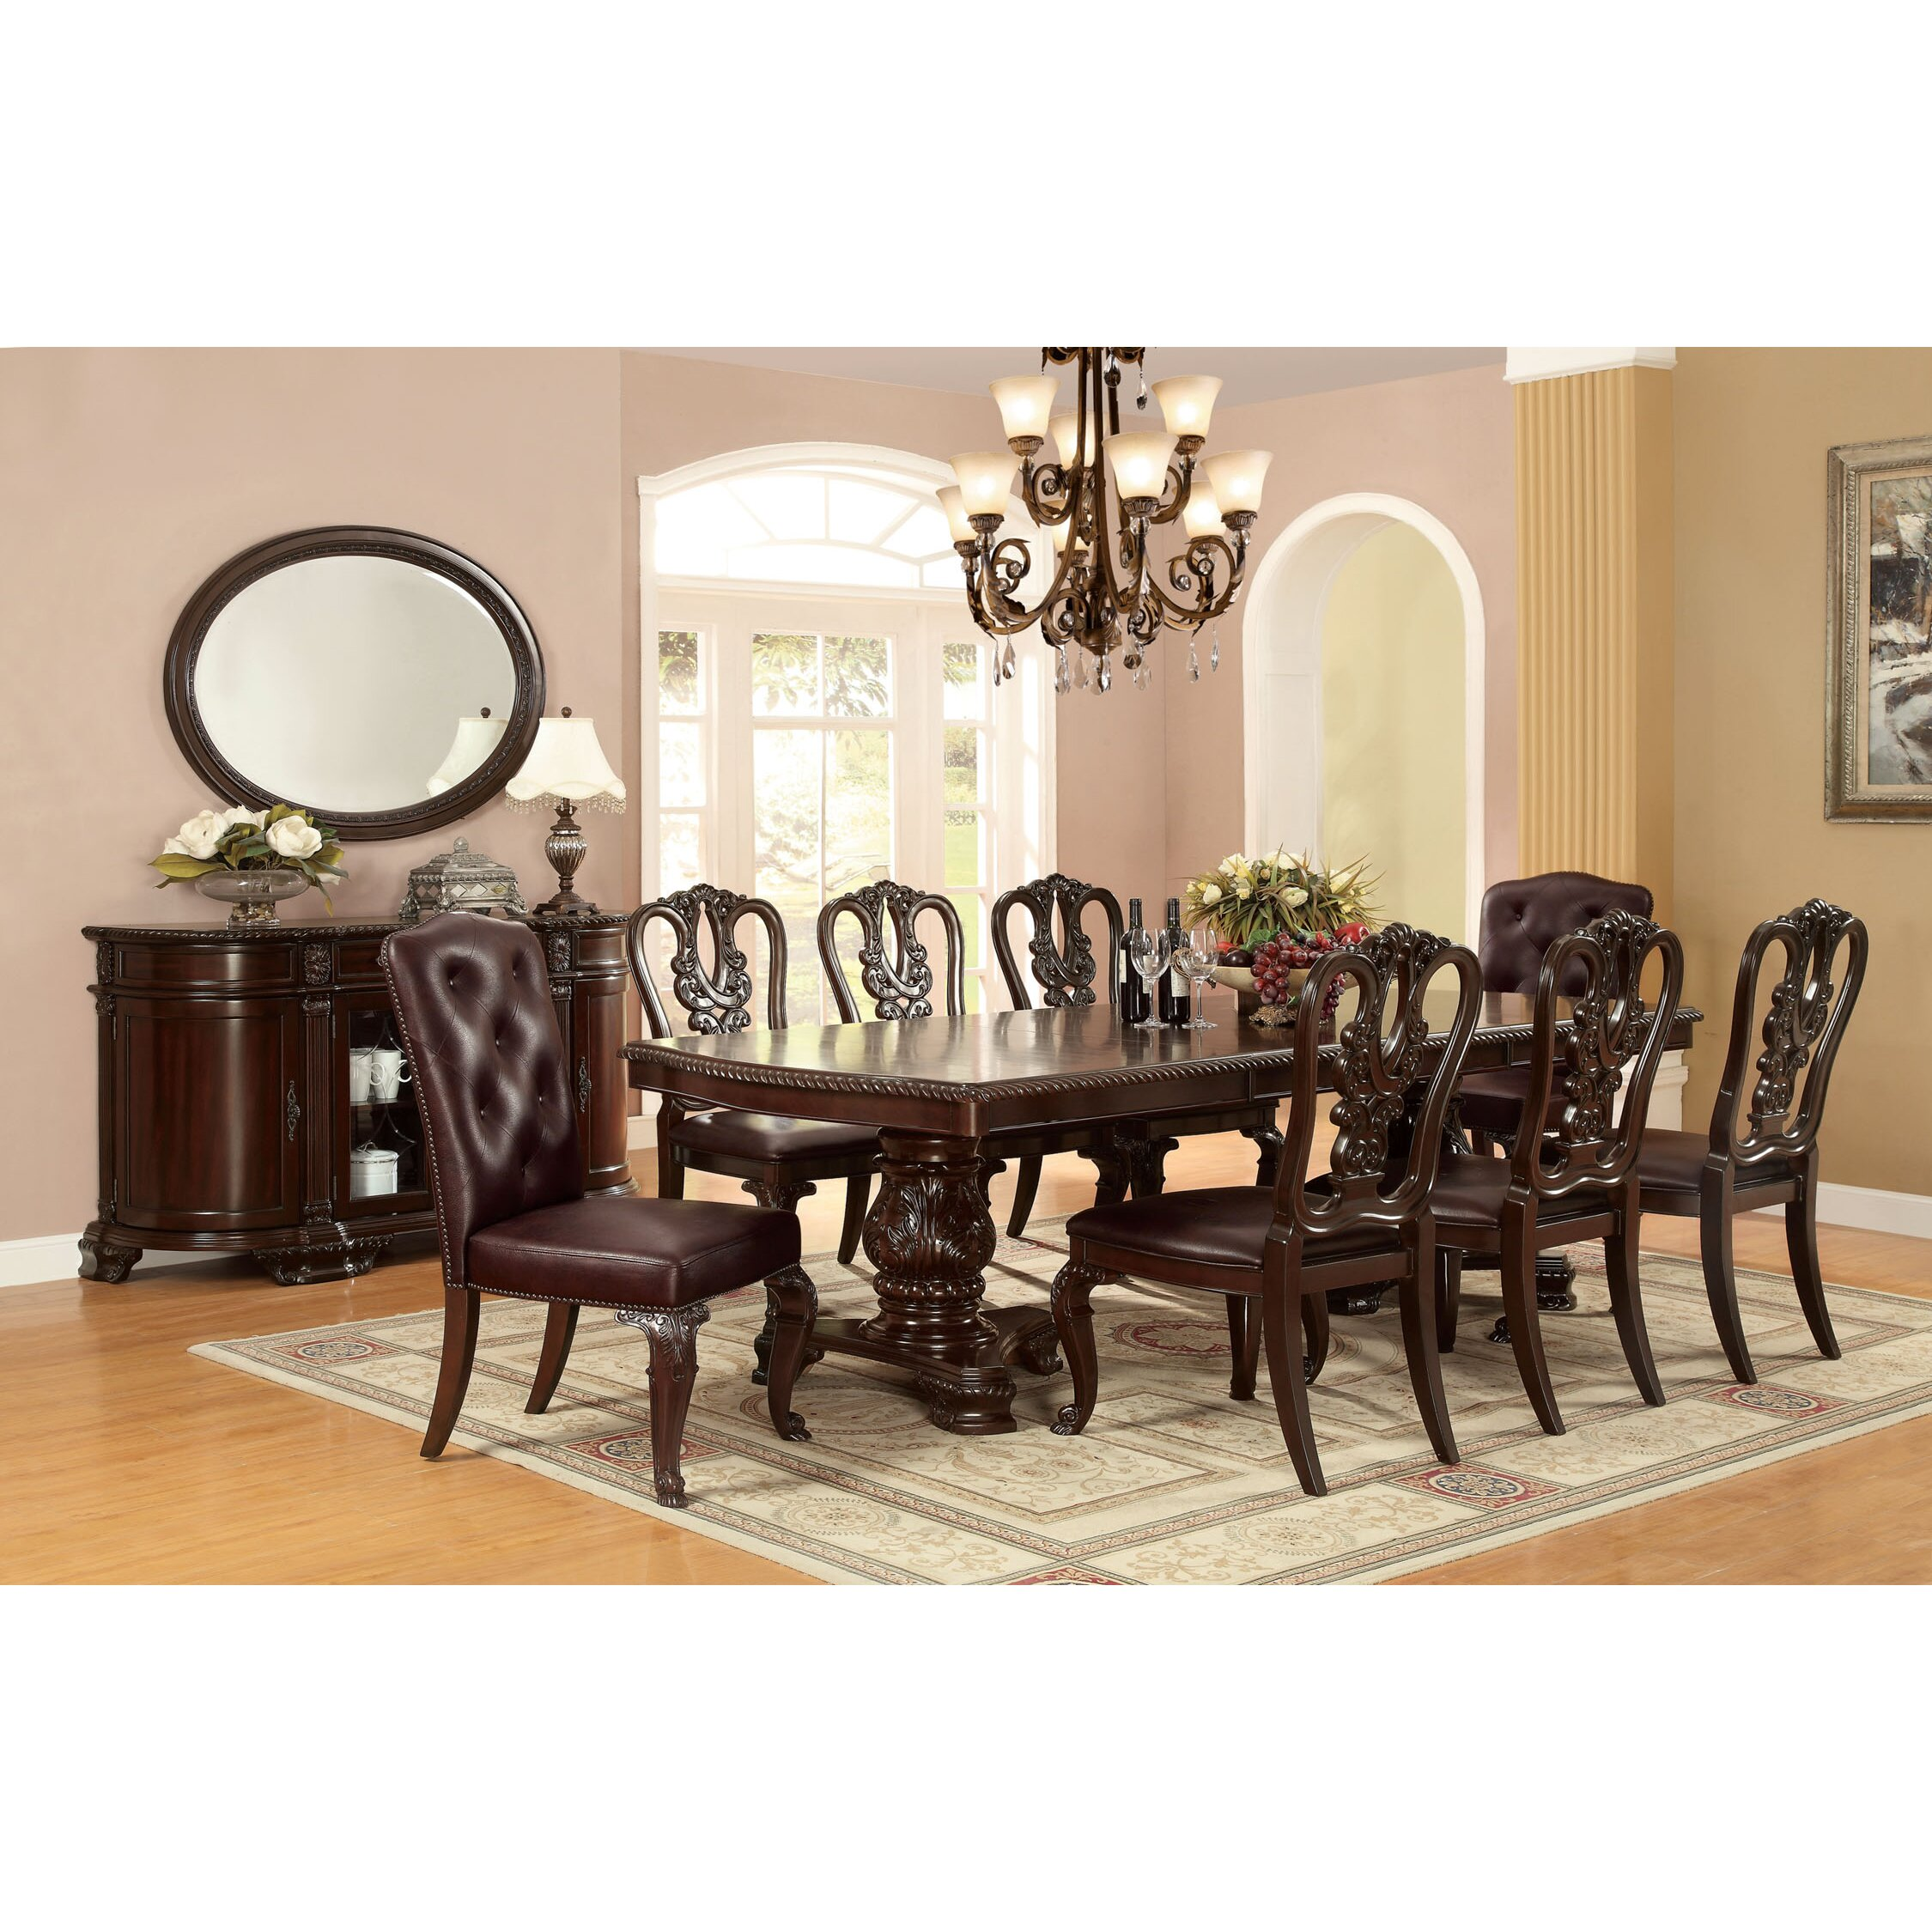 Hokku designs eleanora 9 piece dining set wayfair for Hokku designs dining room furniture